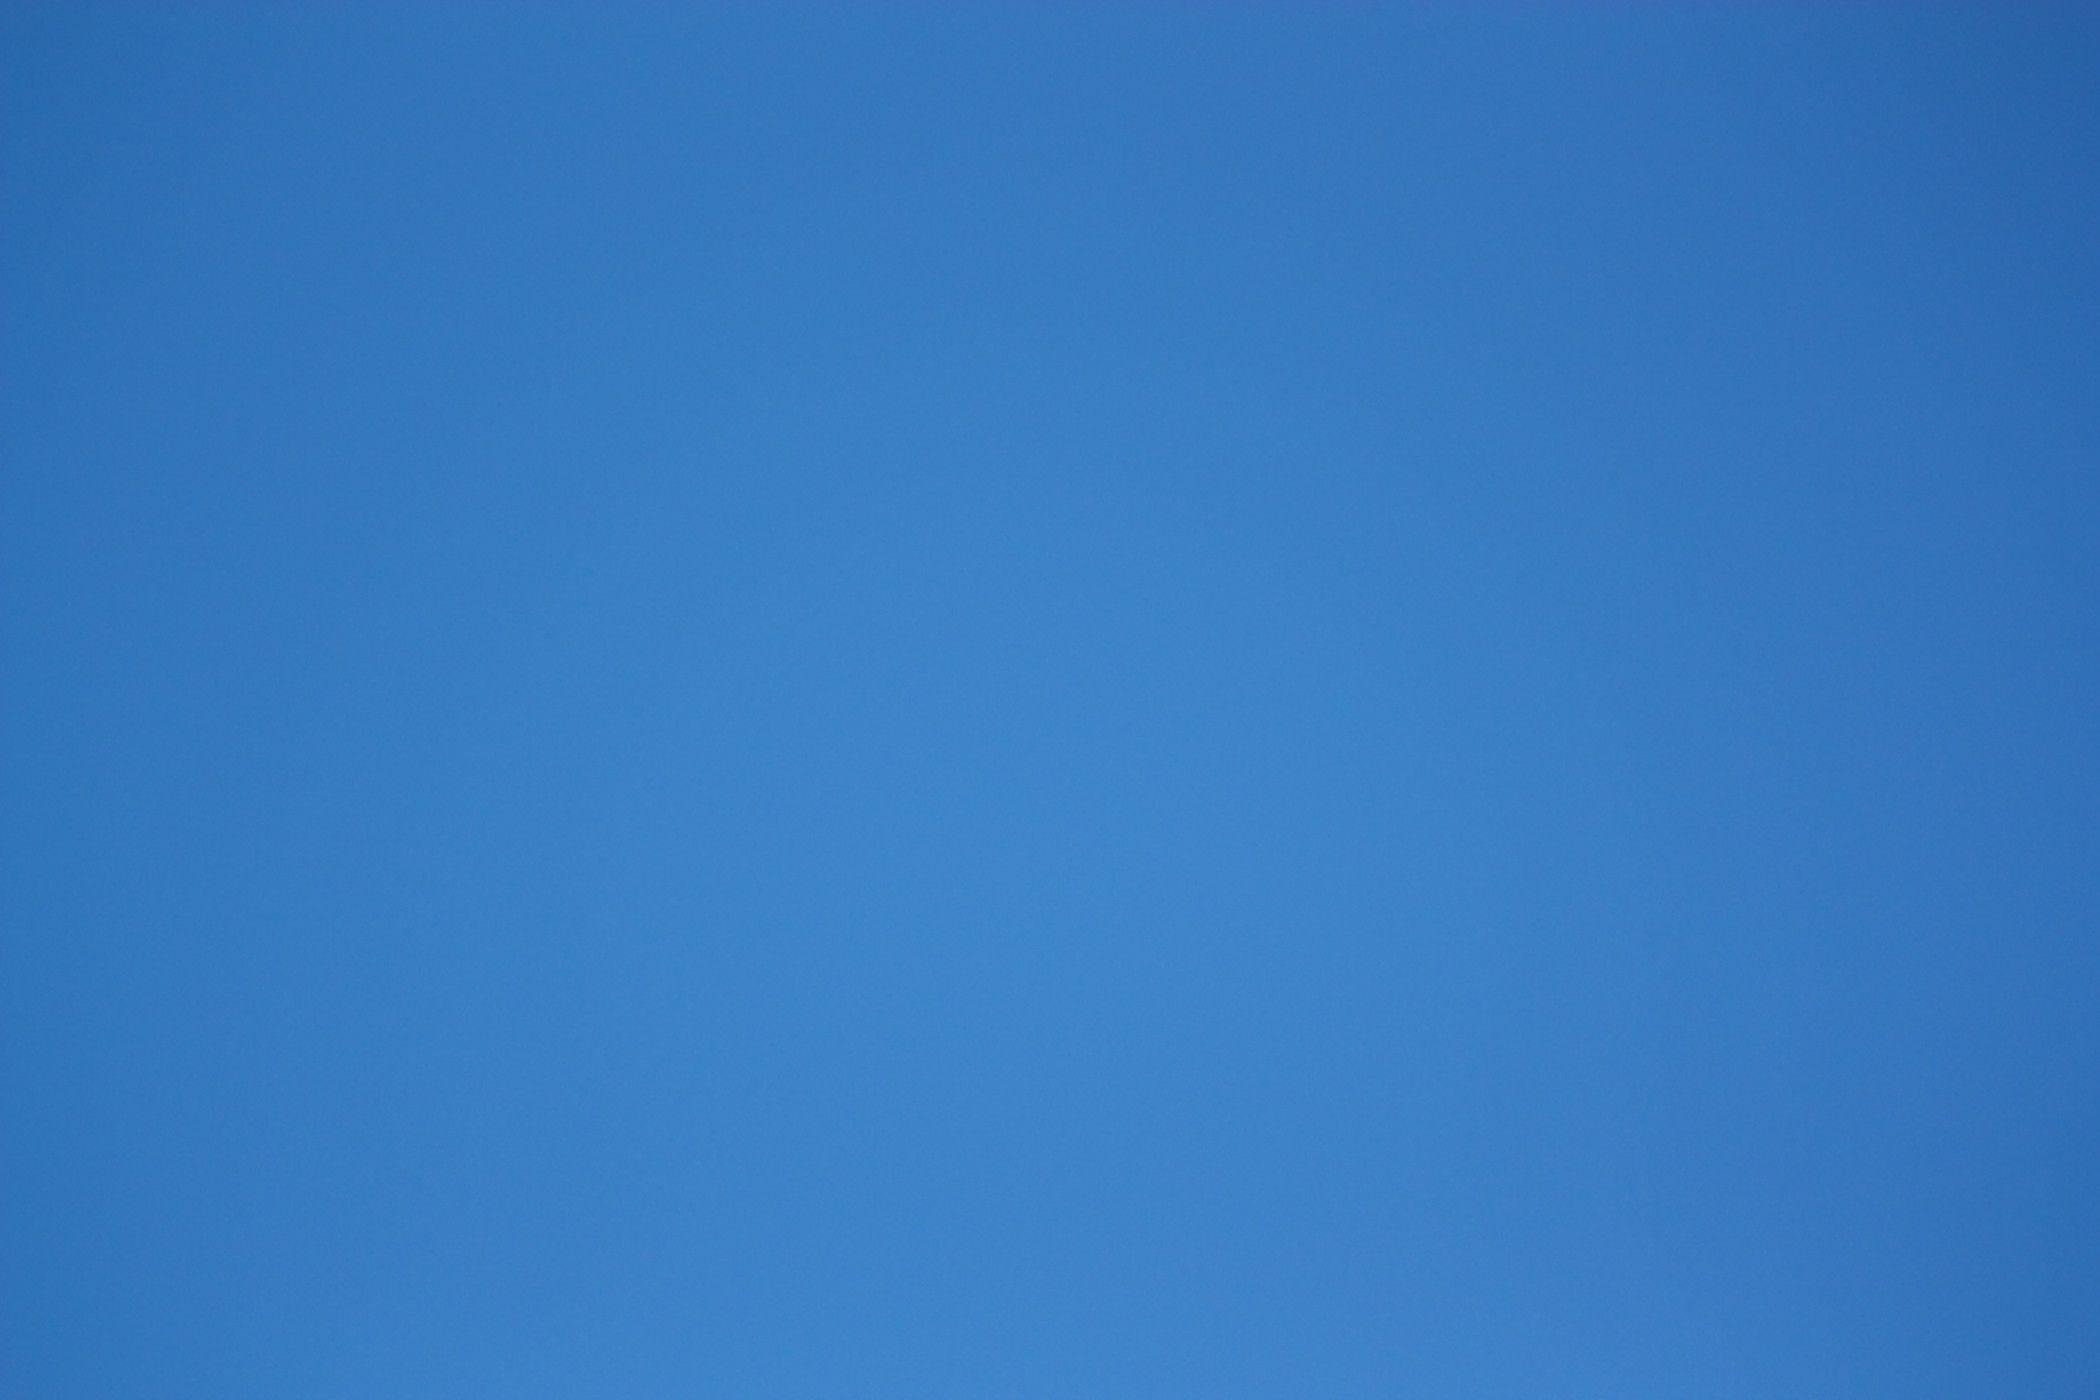 Plain Dark Blue Wallpaper Plain Blue Background 385436